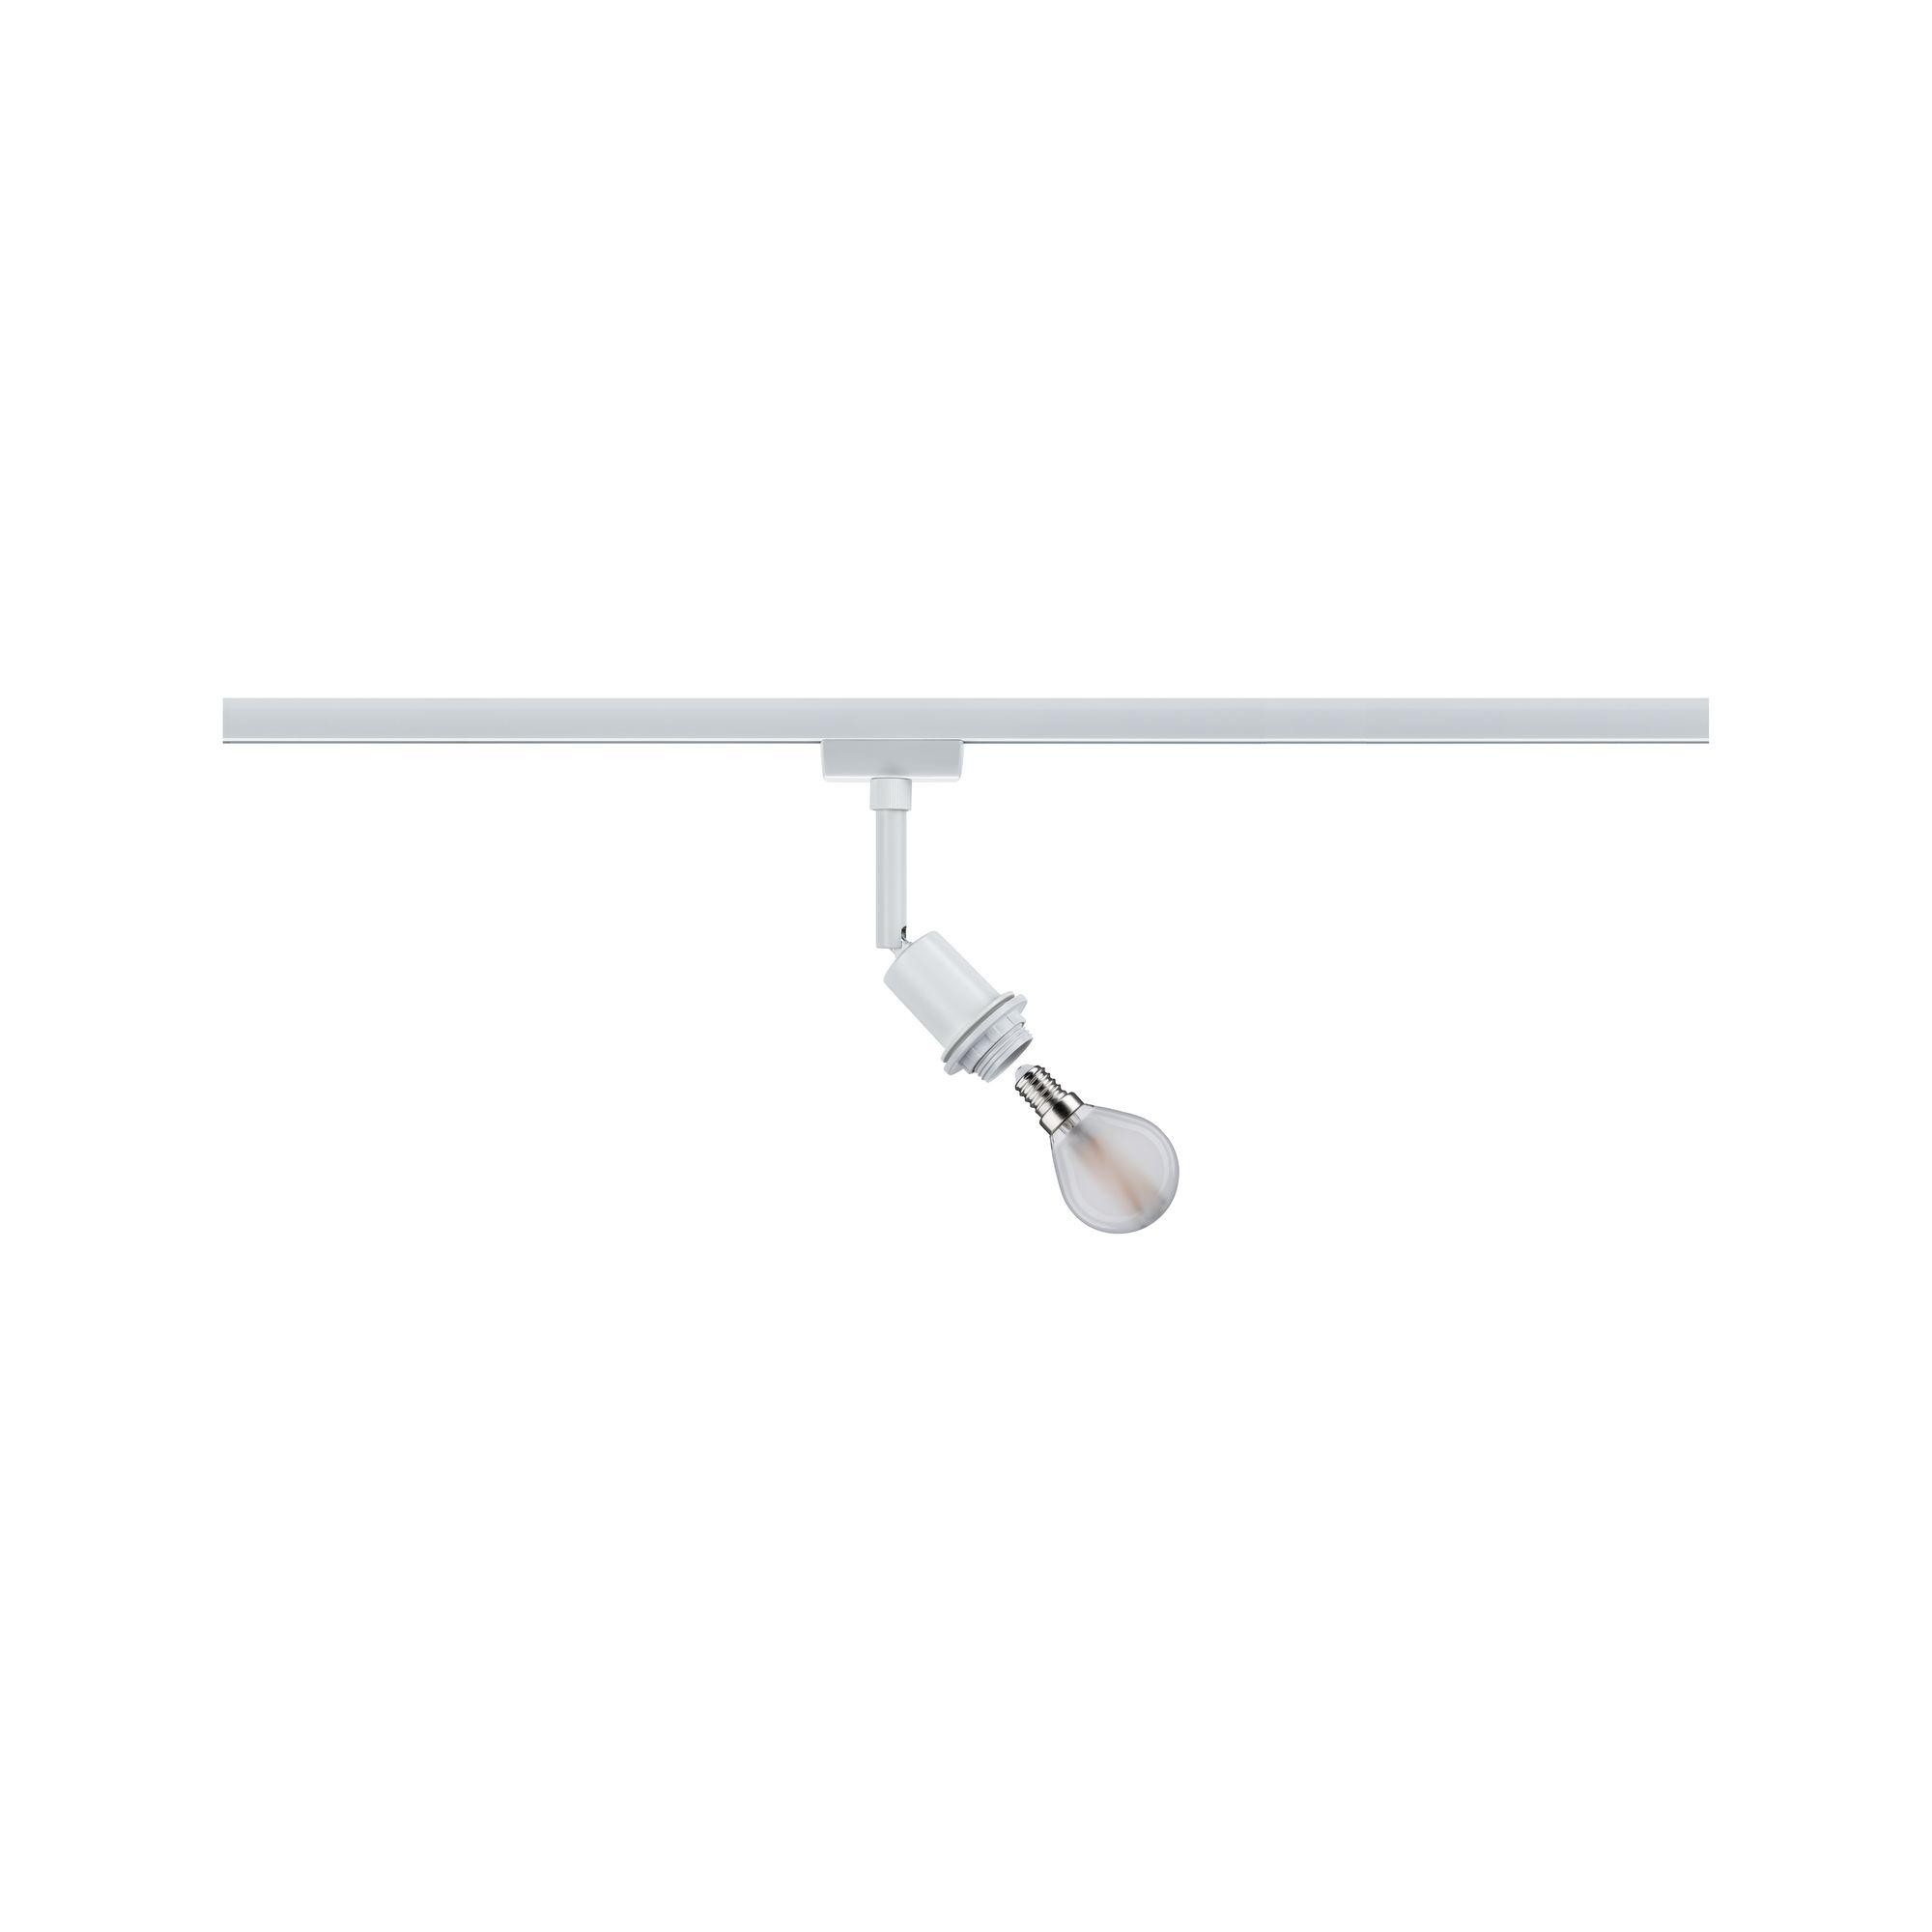 Paulmann URail DecoSystems Spot Weiß max. 1x20W E14 ohne Leuchtmittel